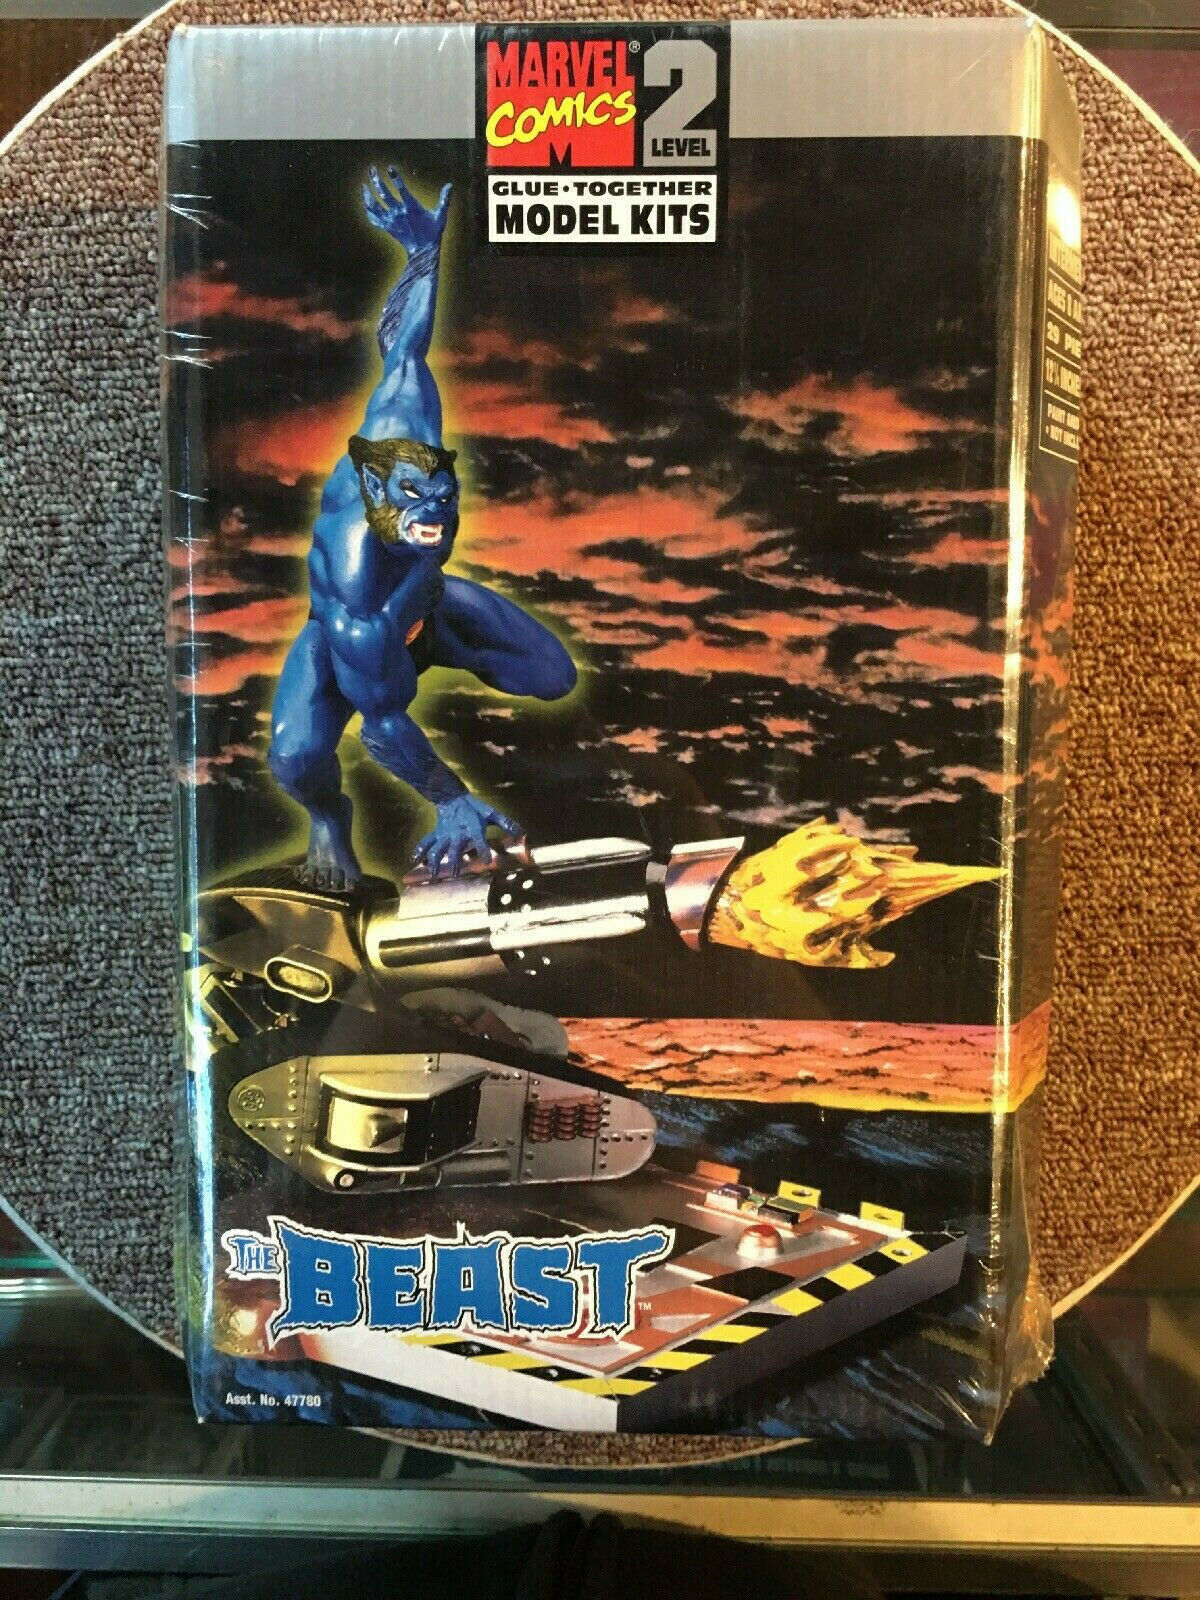 Toy Biz - Marvel Comics - Glue Together Model Kits - Level 2 - The Beast - MIB